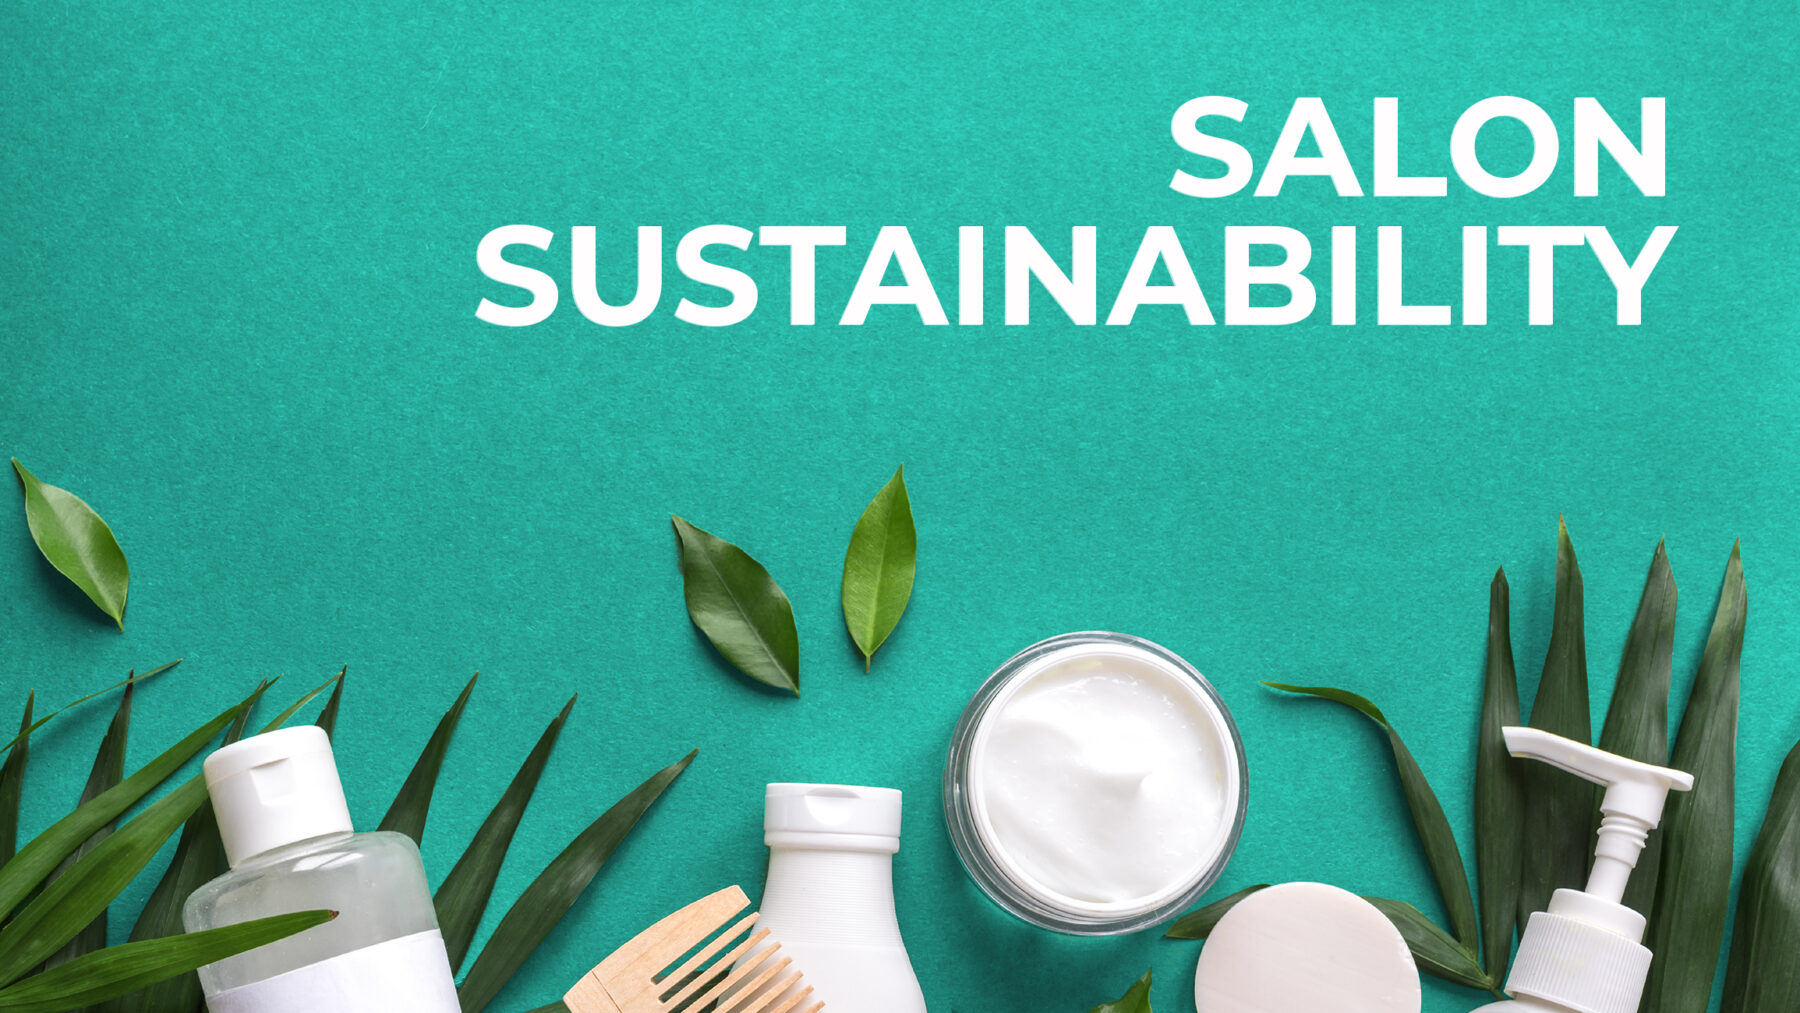 Salon Sustainability with JC Aucamp